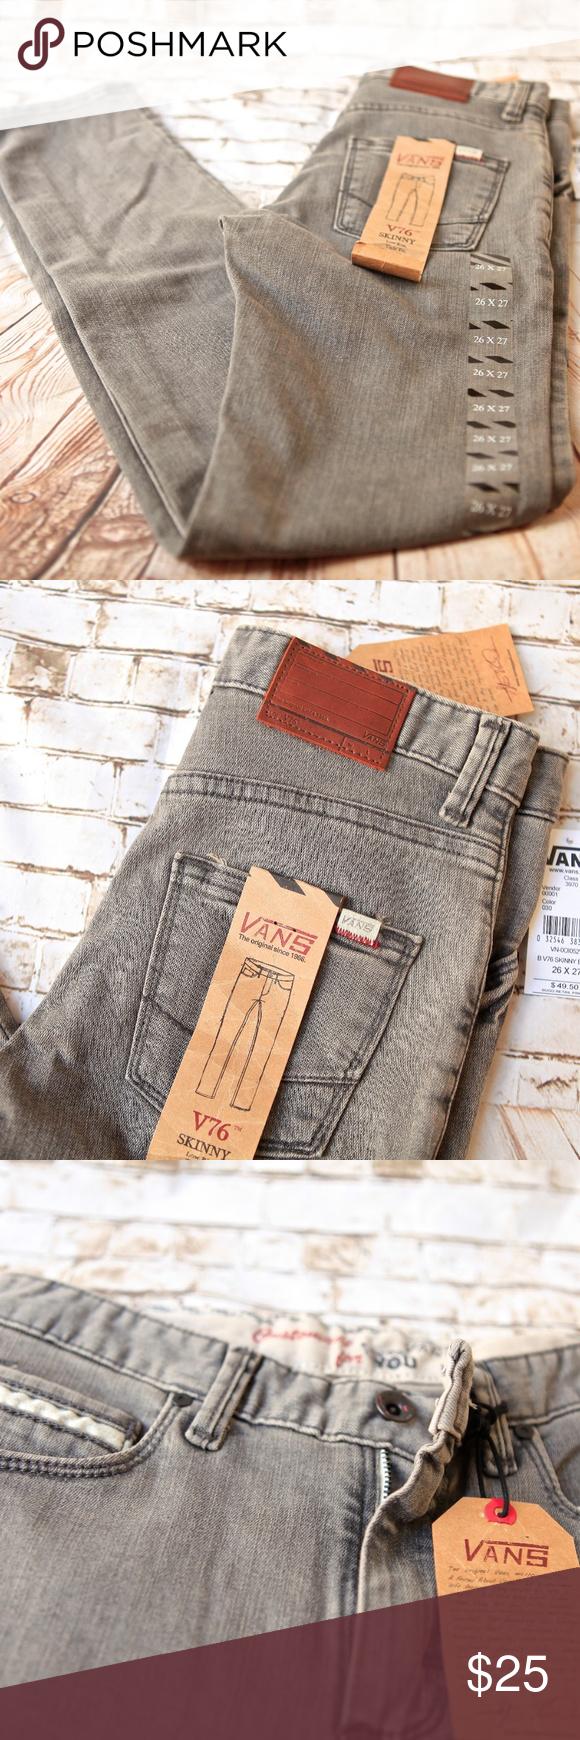 330d775aca BRAND NEW VANS jeans V76 SKINNY BOYS VANS jeans V76 SKINNY COLOR  Gravel  Grey Size